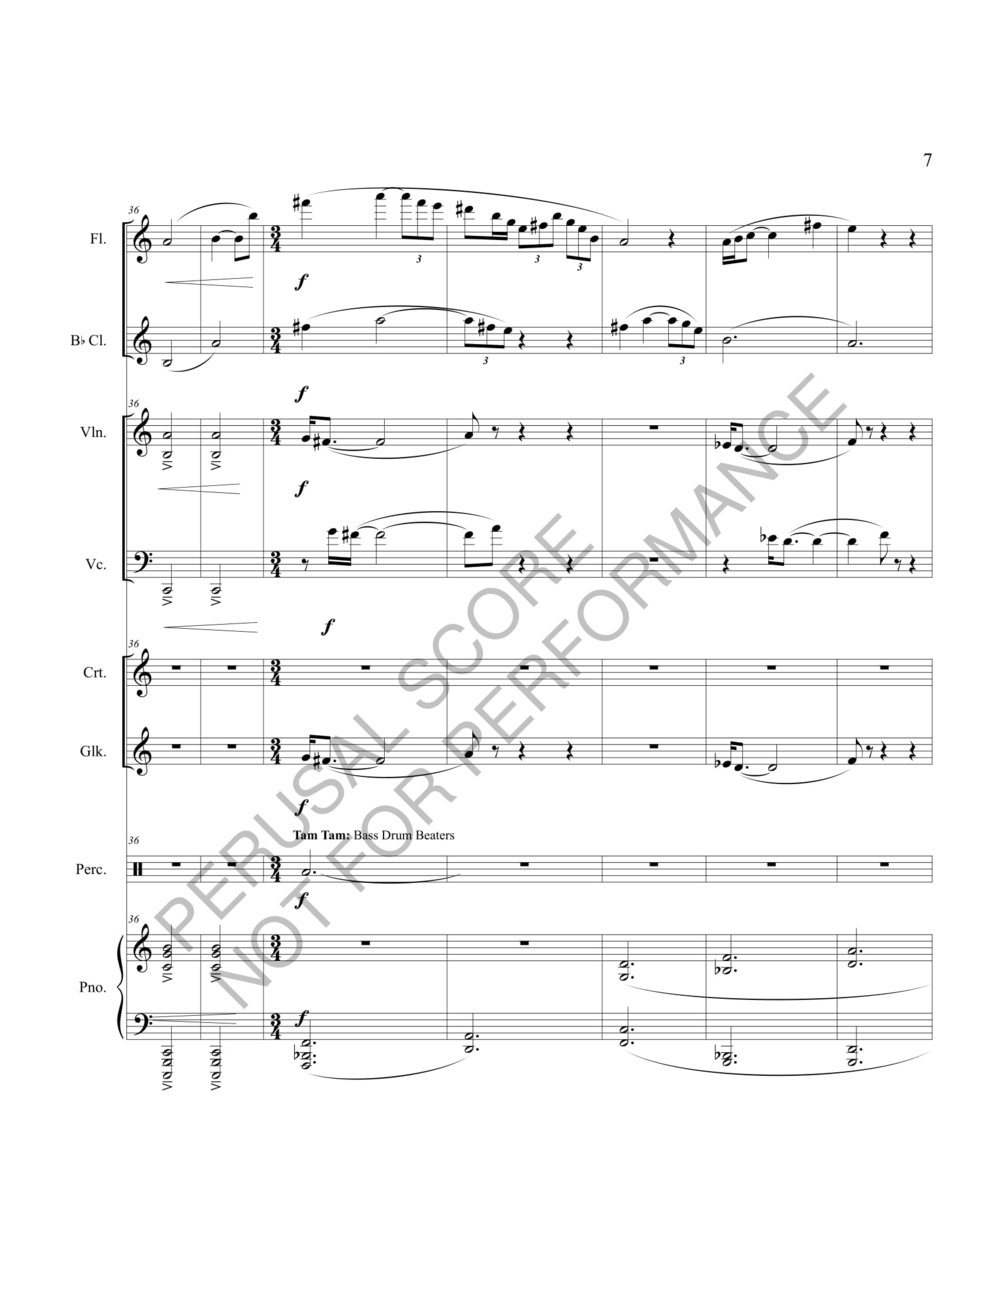 Boyd Terra Liberi Score-watermark-13.jpg